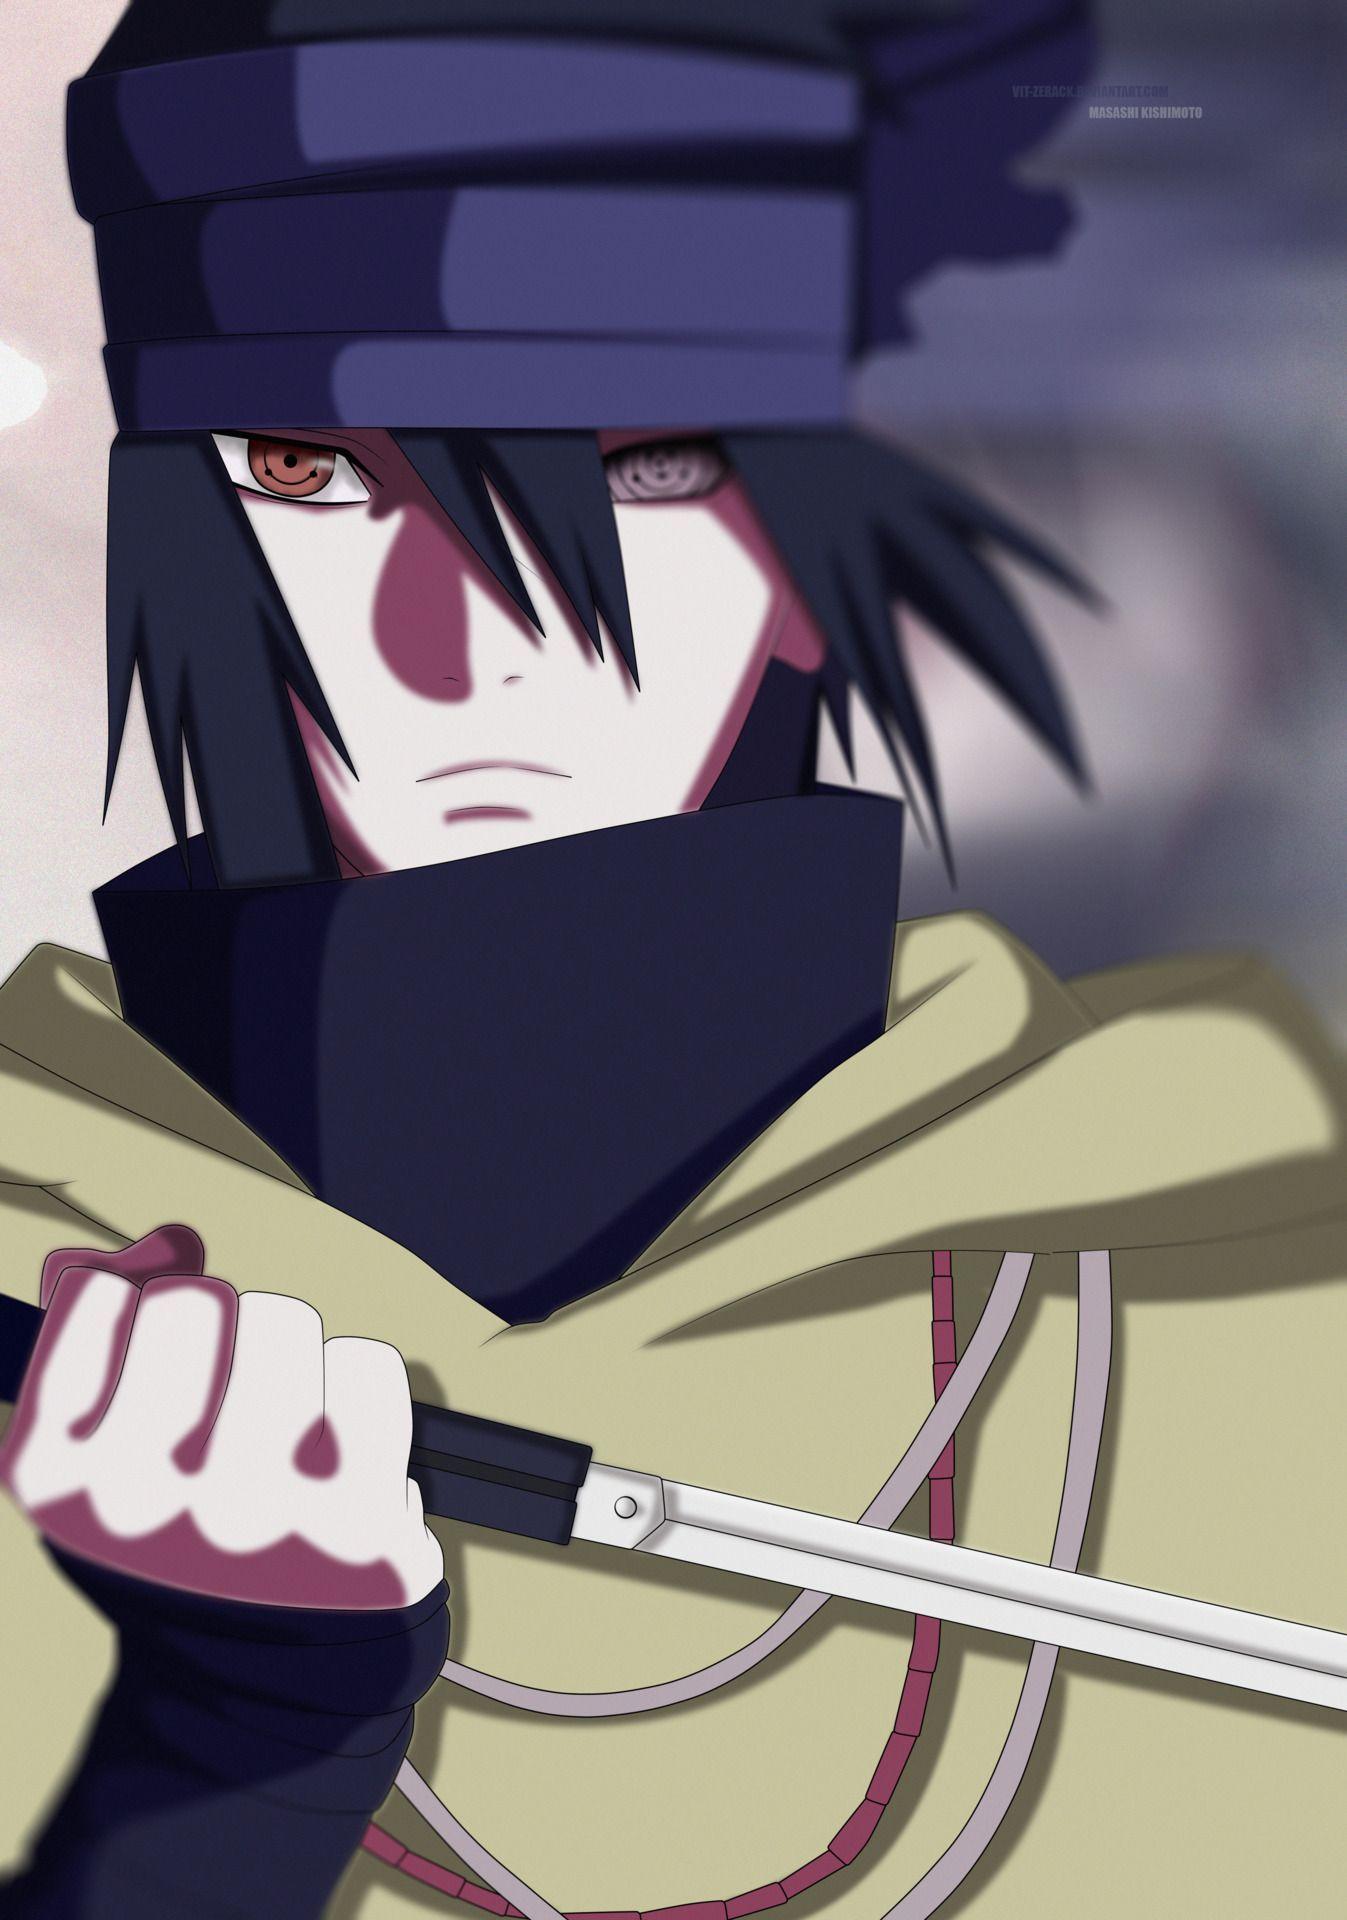 Sasuke The Last Wallpapers Top Free Sasuke The Last Backgrounds Wallpaperaccess Fotos De Naruto Personajes De Naruto Arte De Naruto